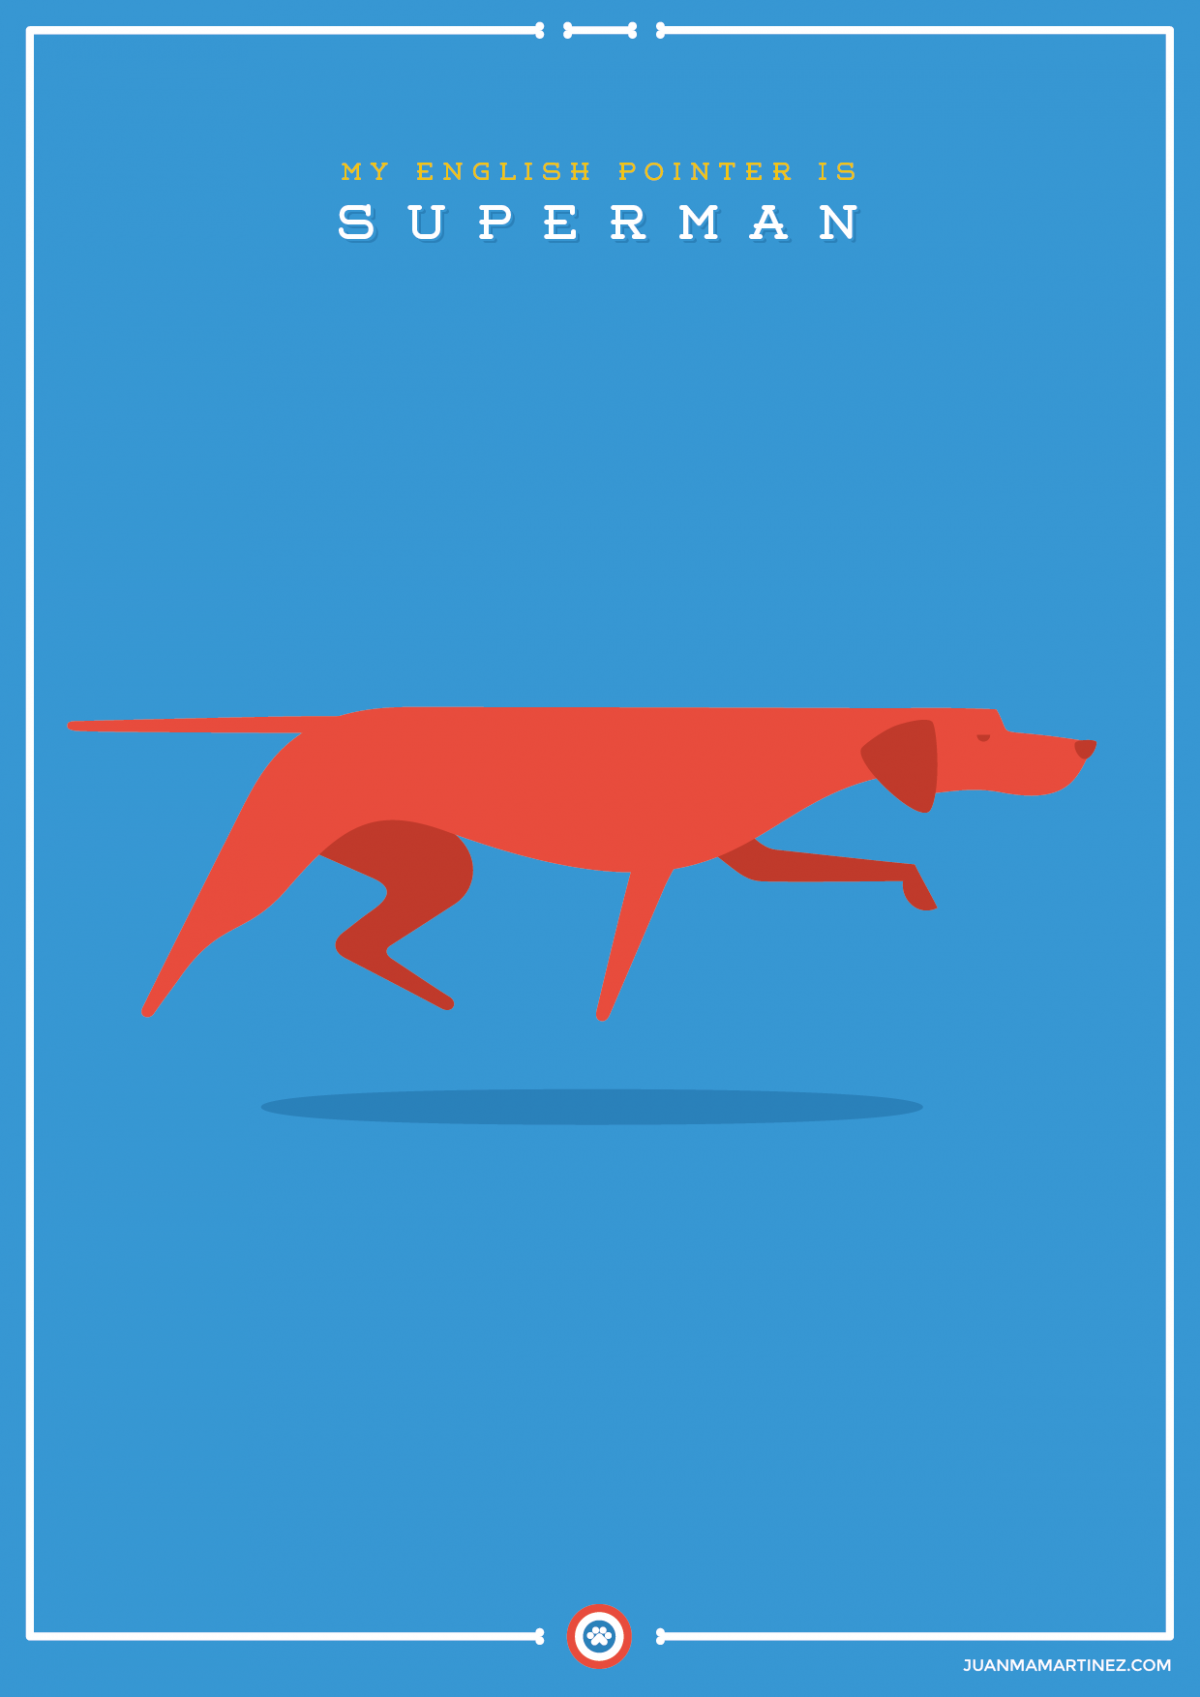 extraordinary-doggies-illustration-5